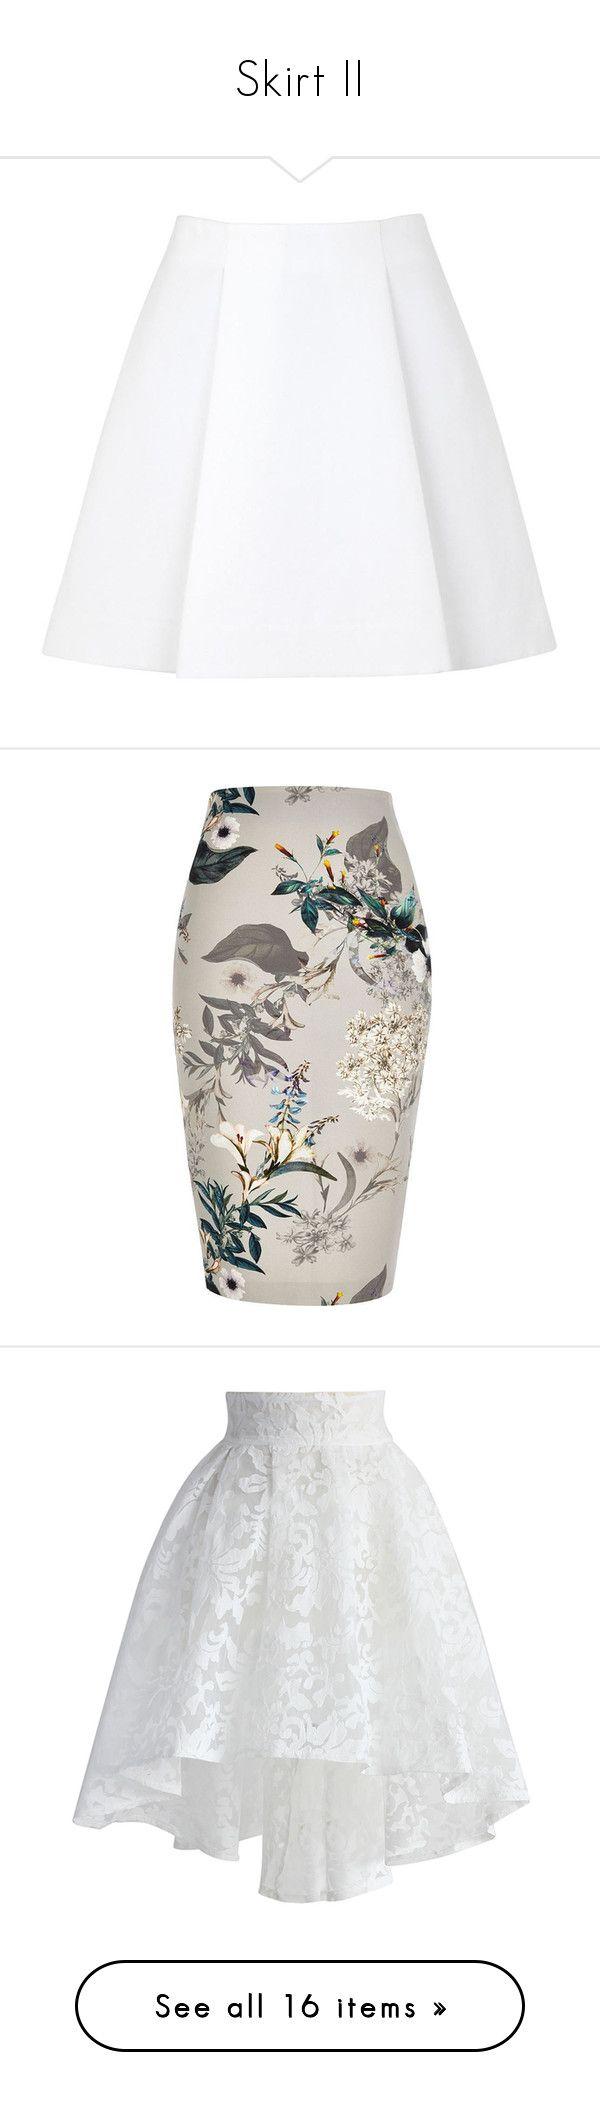 """Skirt II"" by yendry-mariela-garcia-perez ❤ liked on Polyvore featuring skirts, bottoms, faldas, saias, jupe, 3.1 phillip lim skirt, cotton slip, cotton skirts, slip skirt and 3.1 phillip lim"